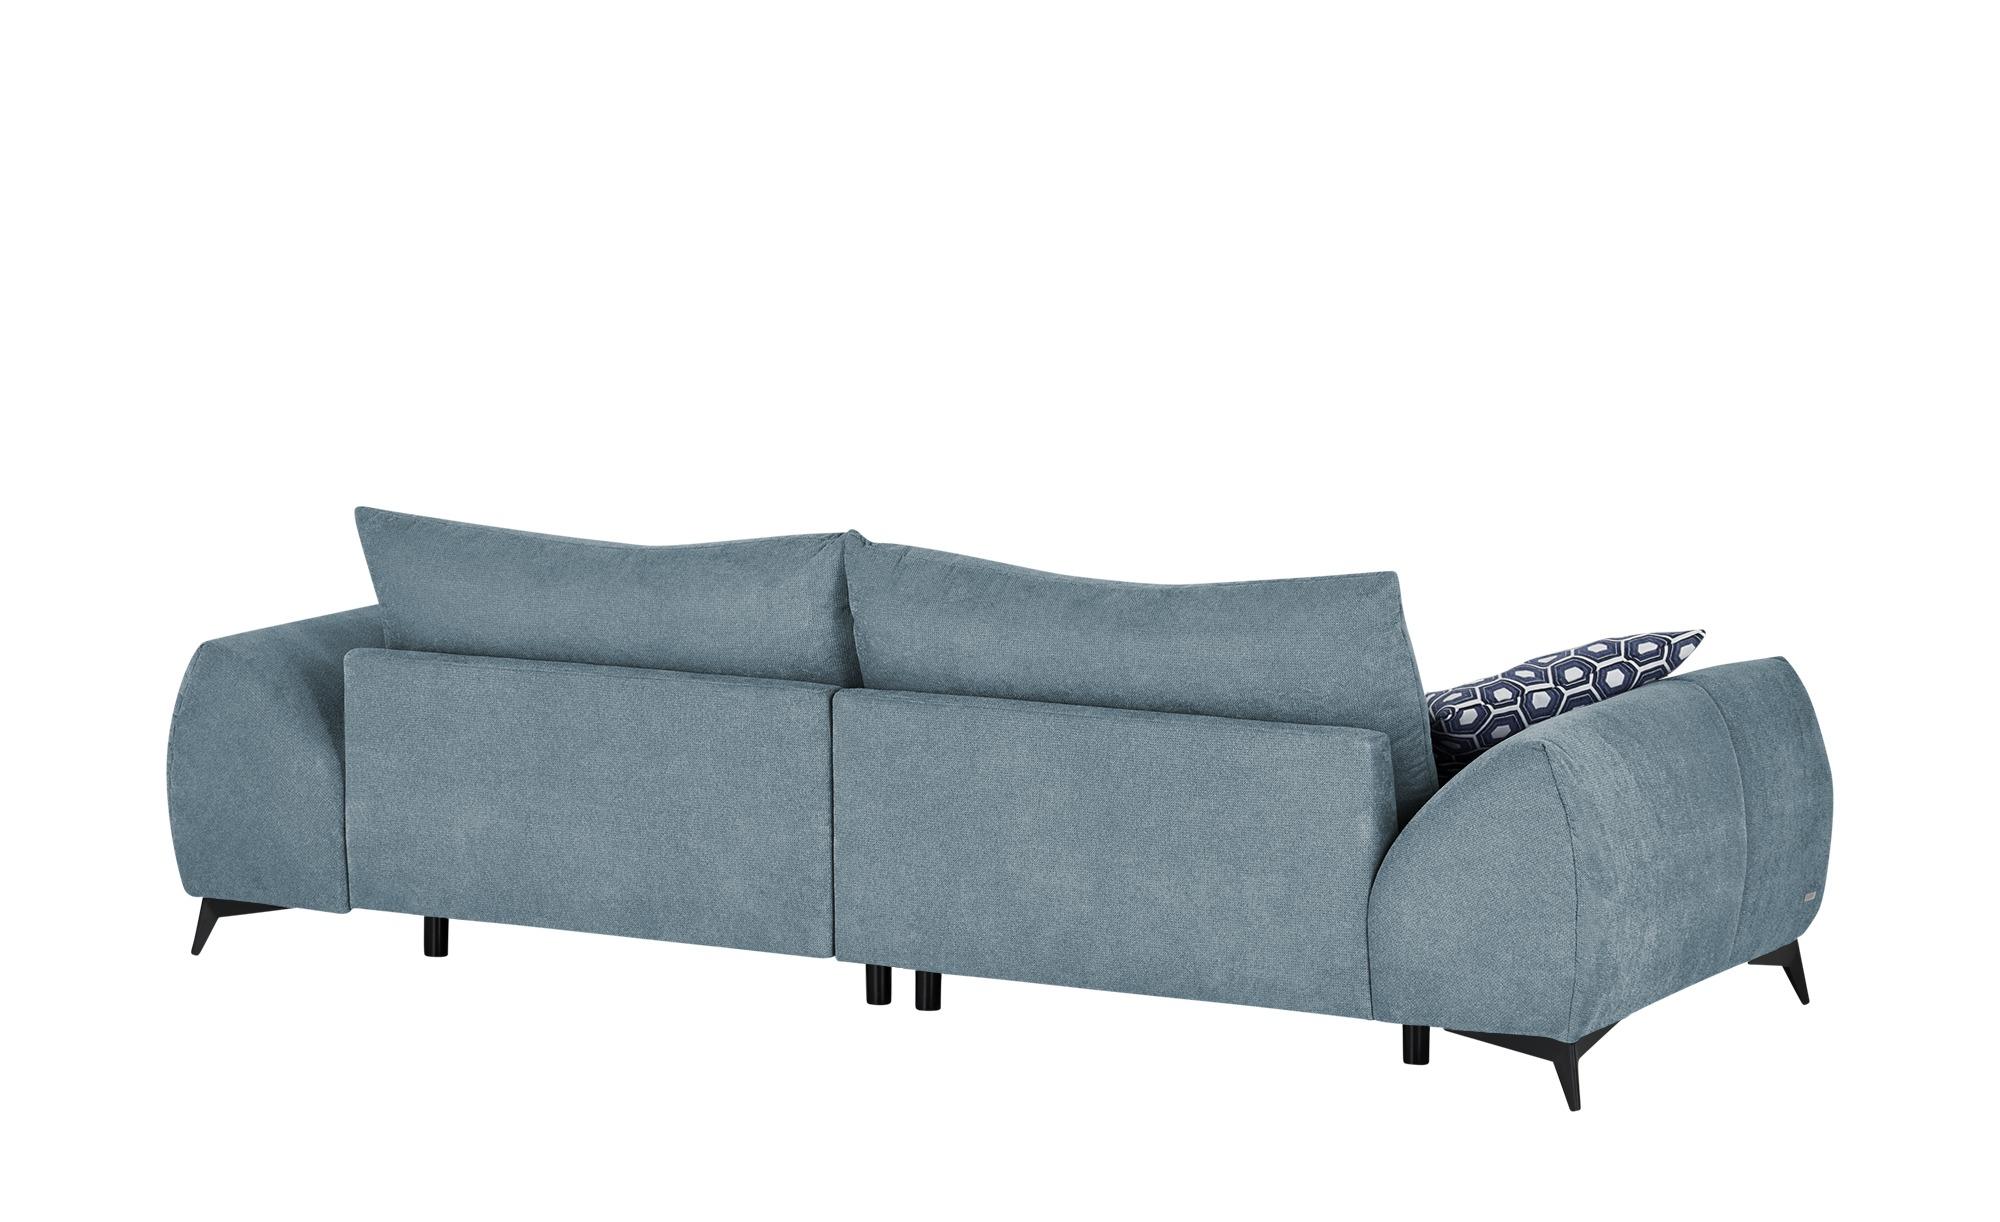 bobb Big Sofa  Dalia ¦ blau ¦ Maße (cm): B: 314 H: 91 T: 123 Polstermöbel > Sofas > Big-Sofas - Höffner